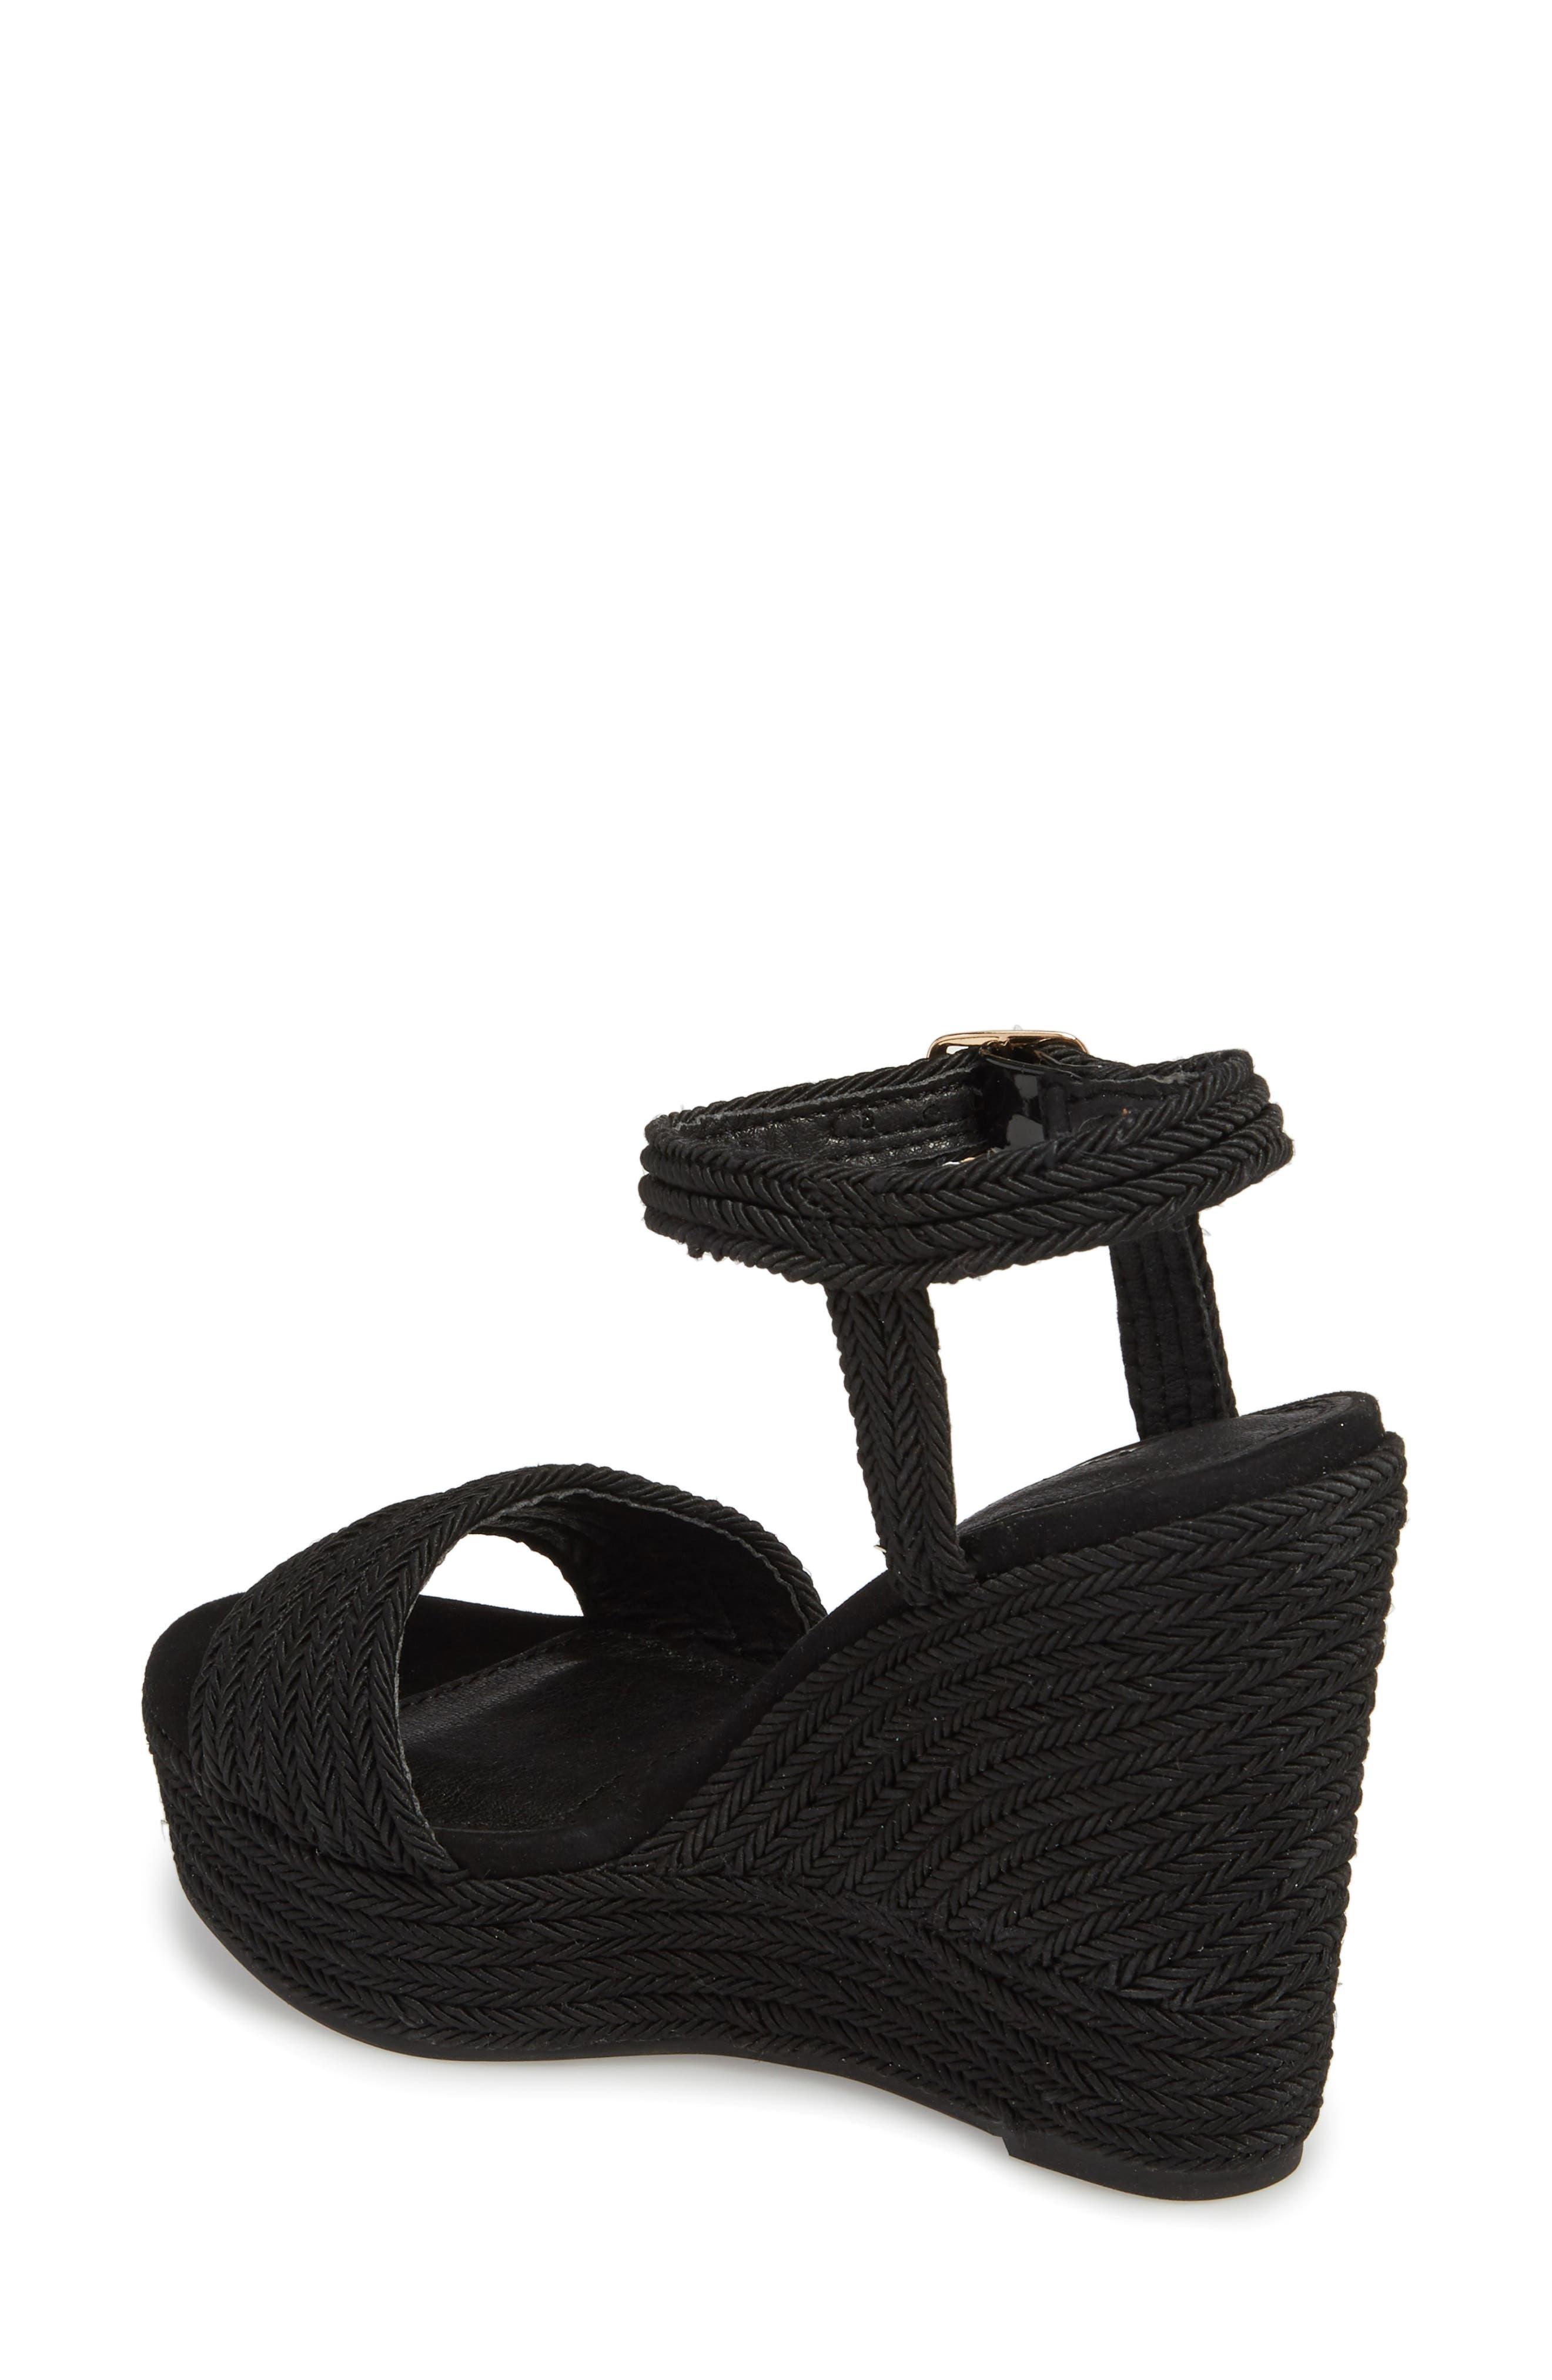 Wild Rope Platform Wedge Sandal,                             Alternate thumbnail 2, color,                             BLACK MULTI